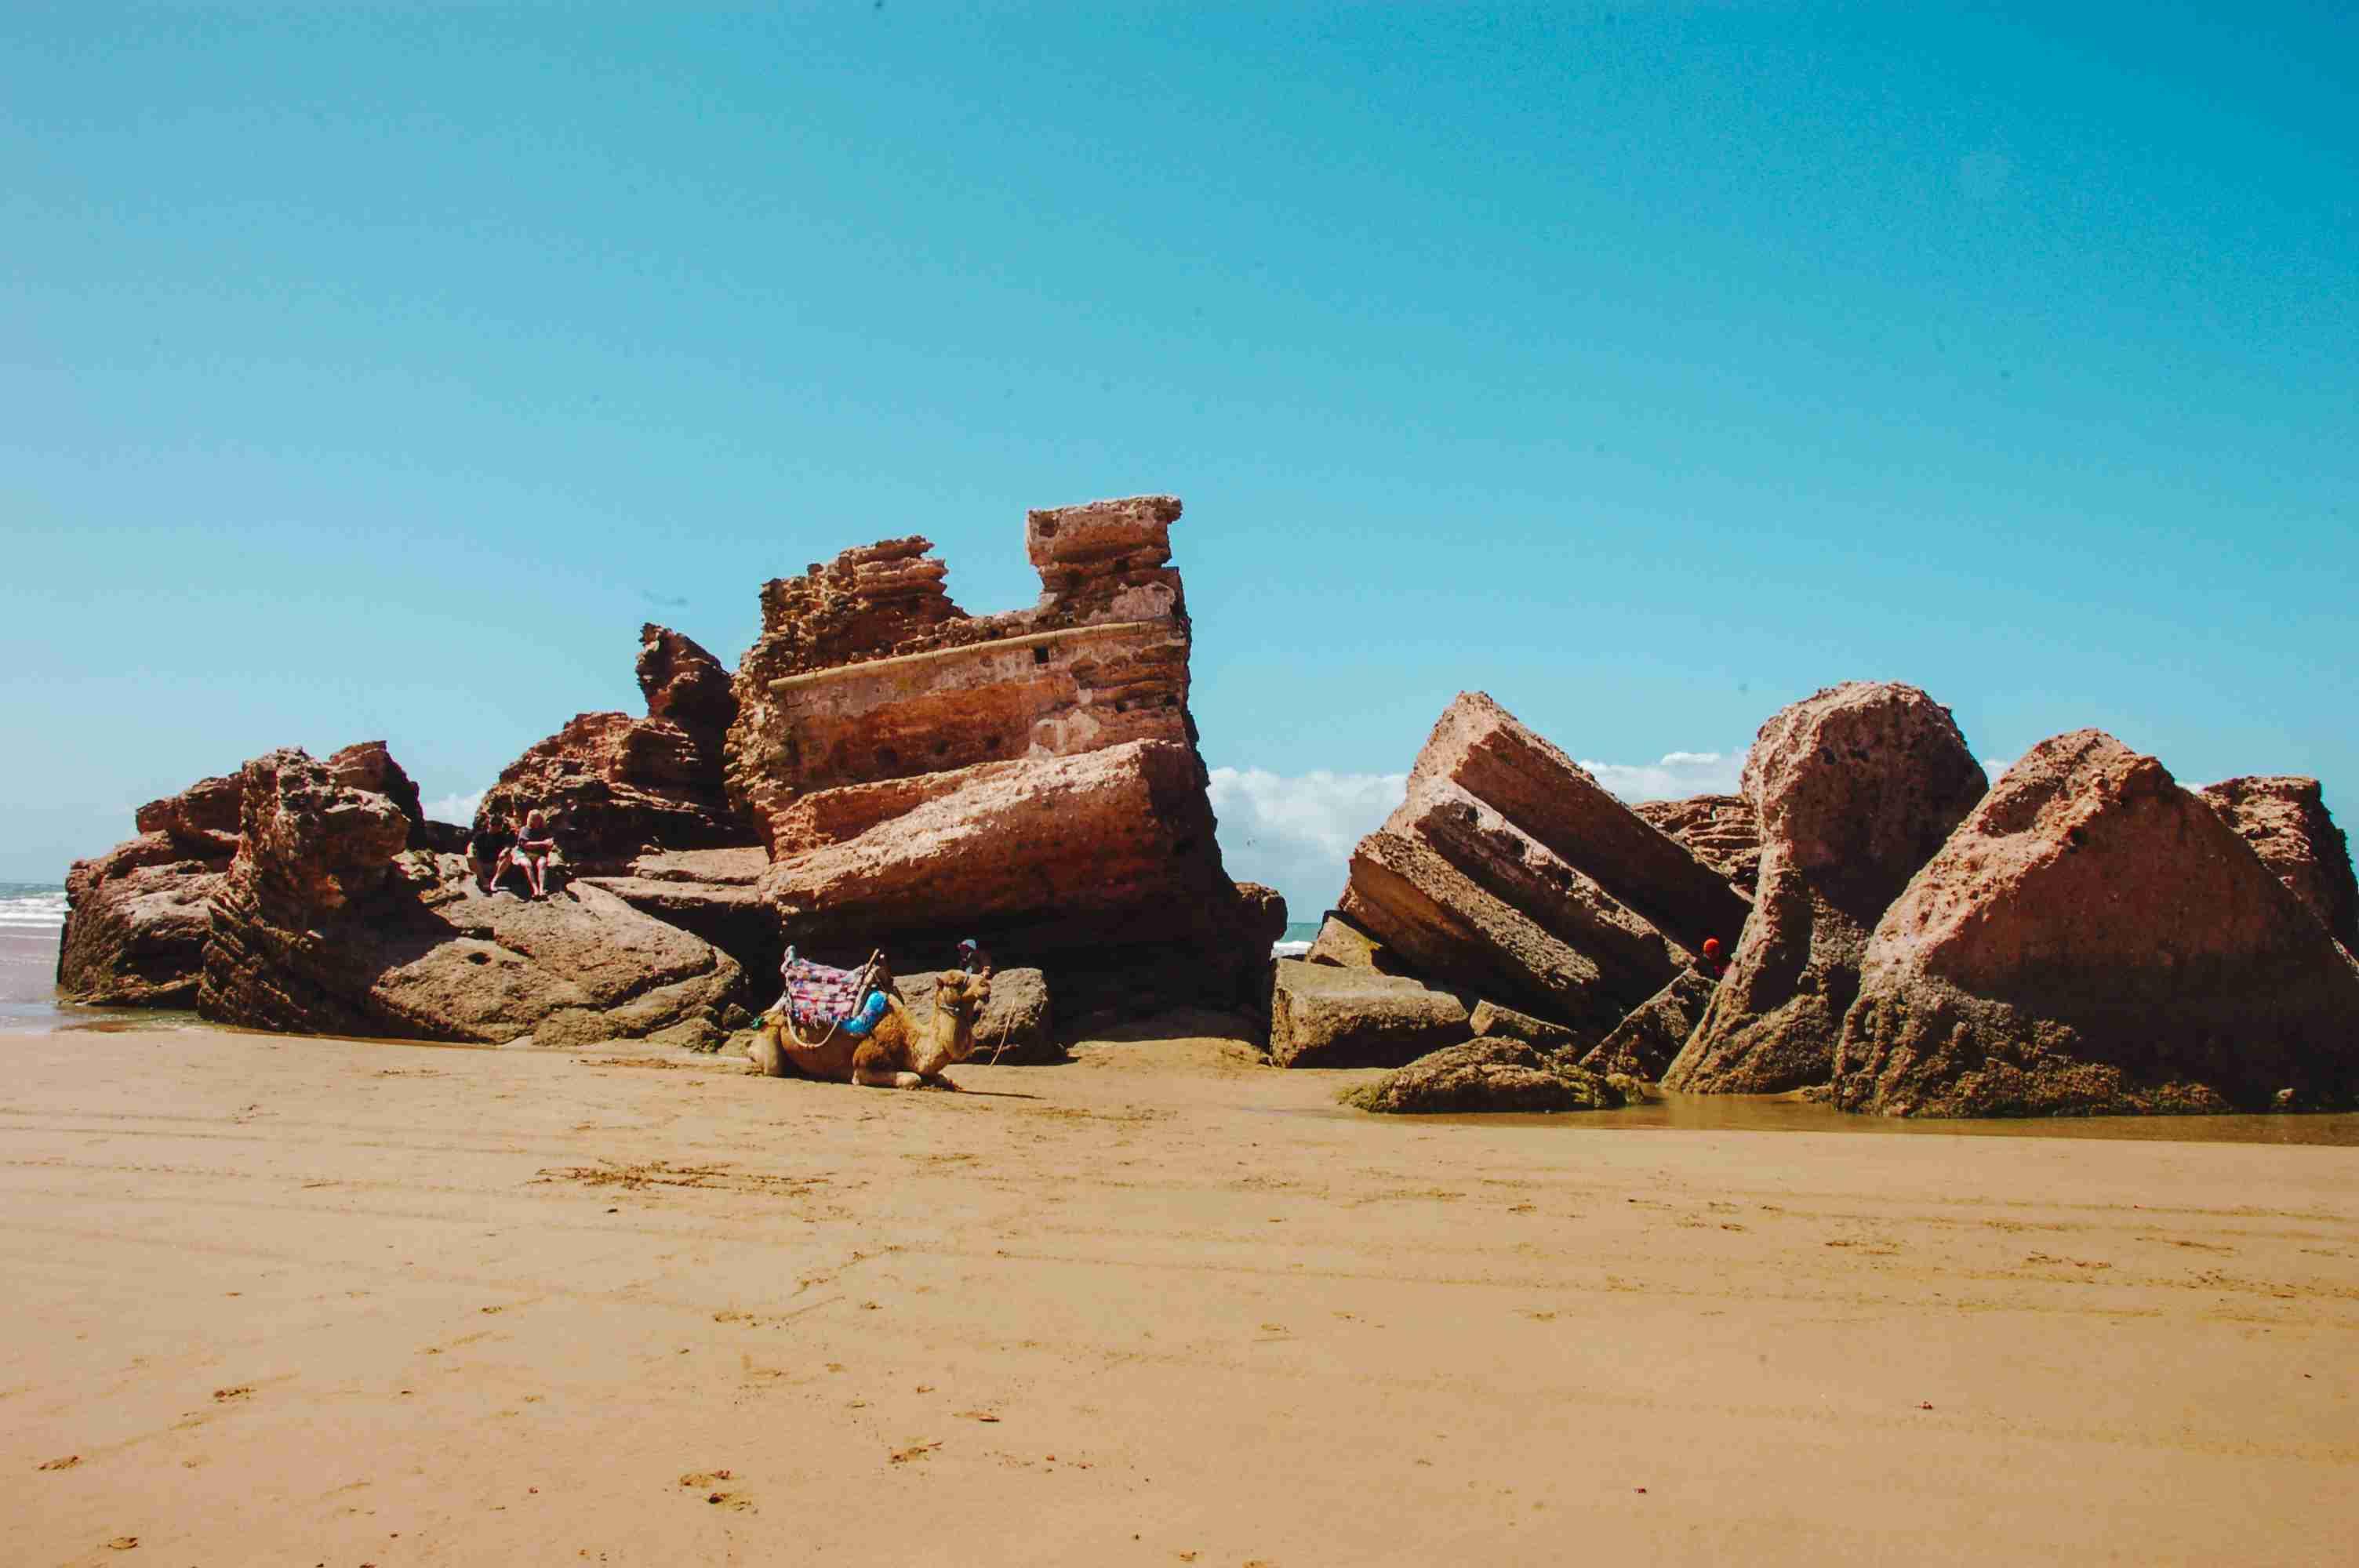 Crumbled ruins by the sea in Essaouira